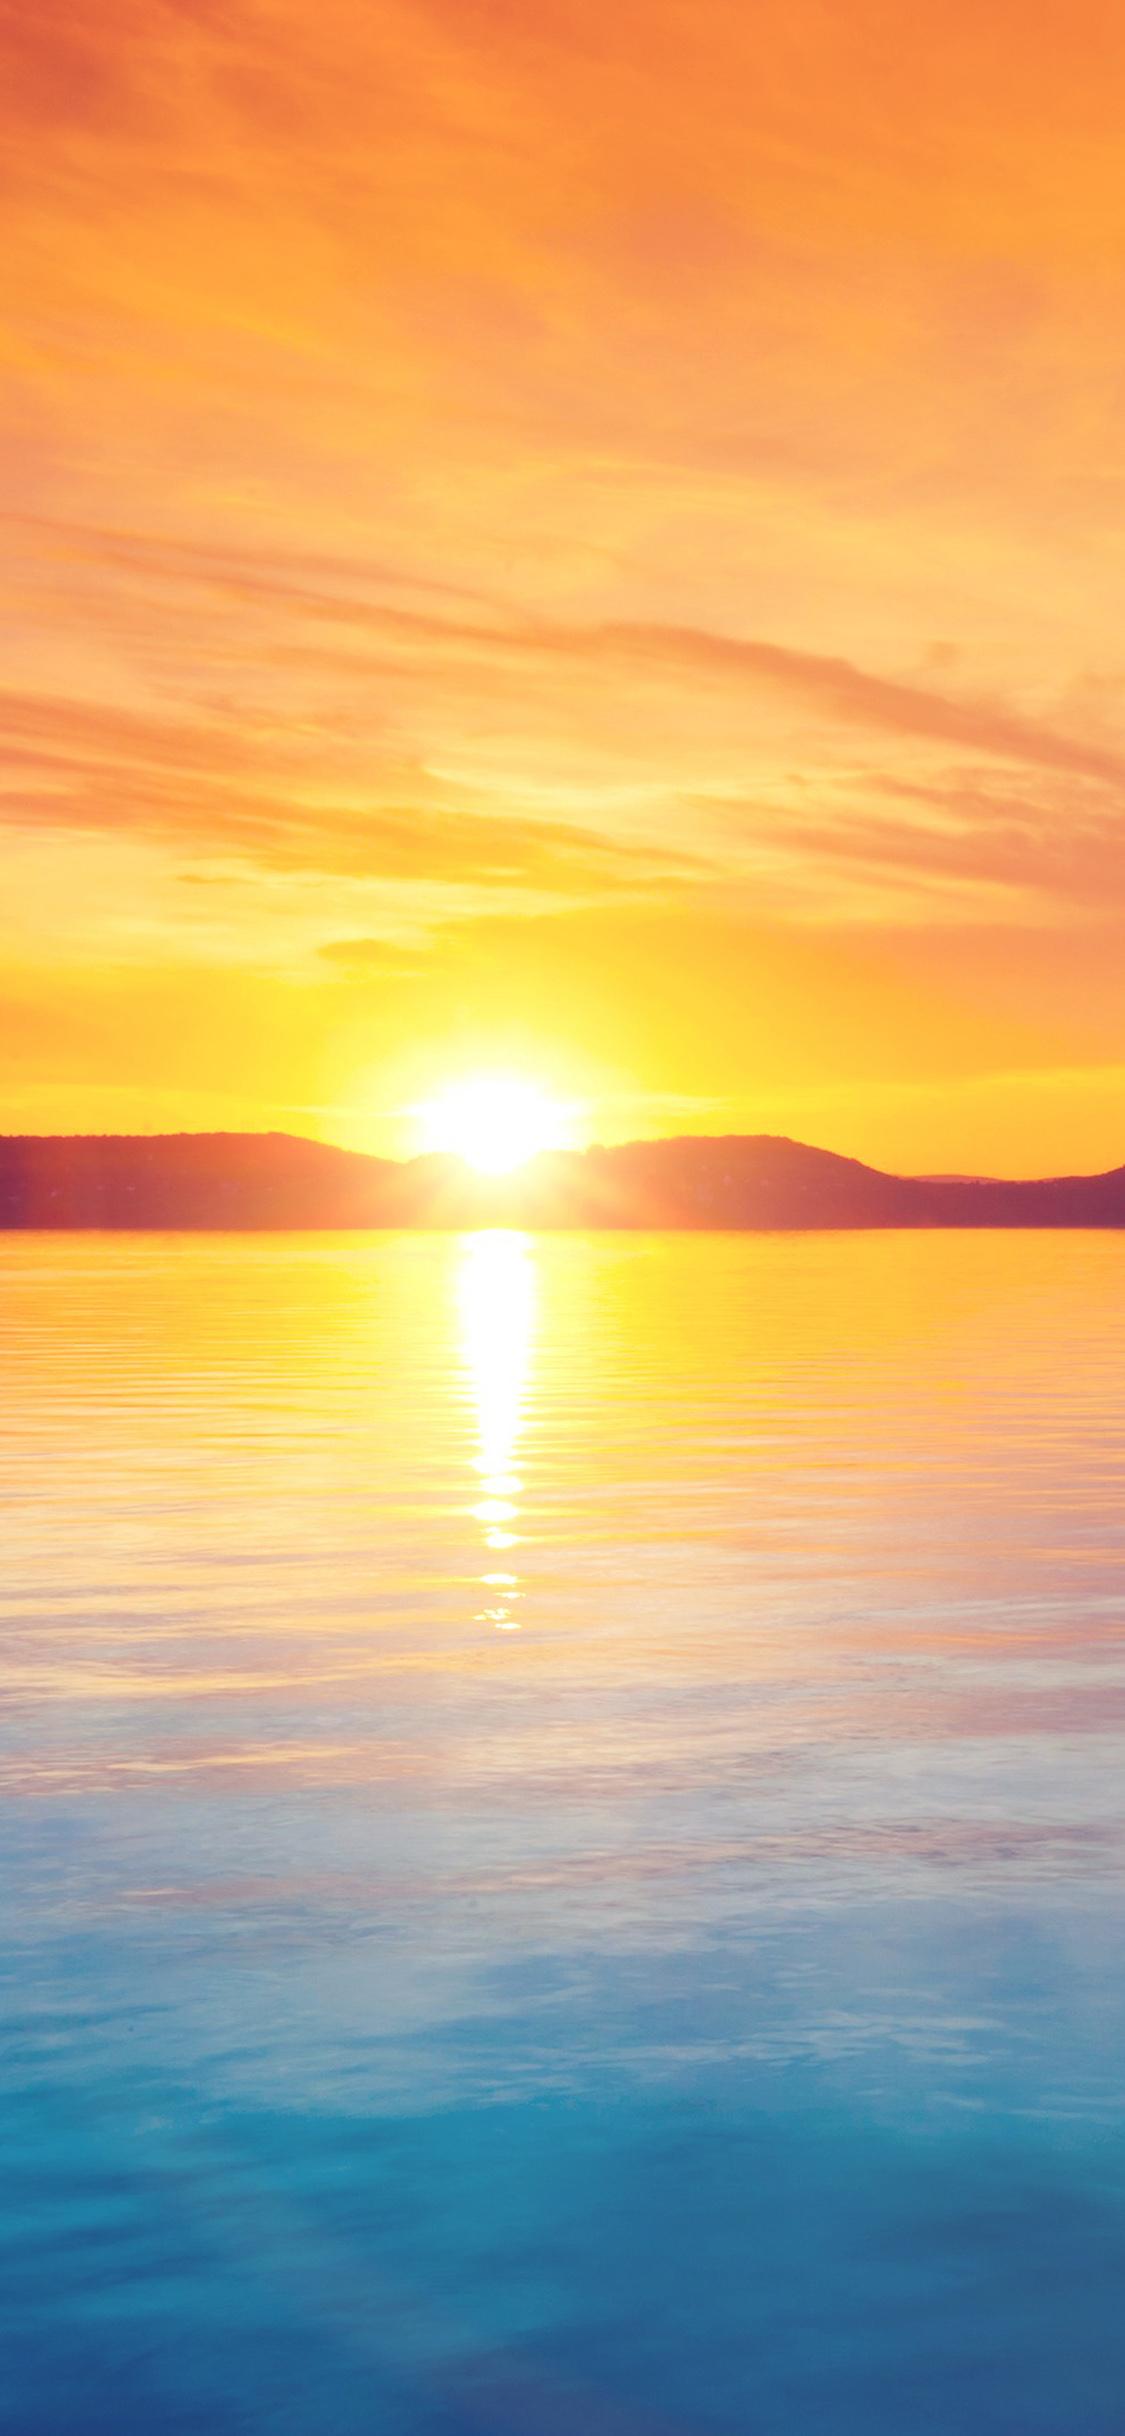 Sunset Night Lake Iphone X Wallpapers Free Download